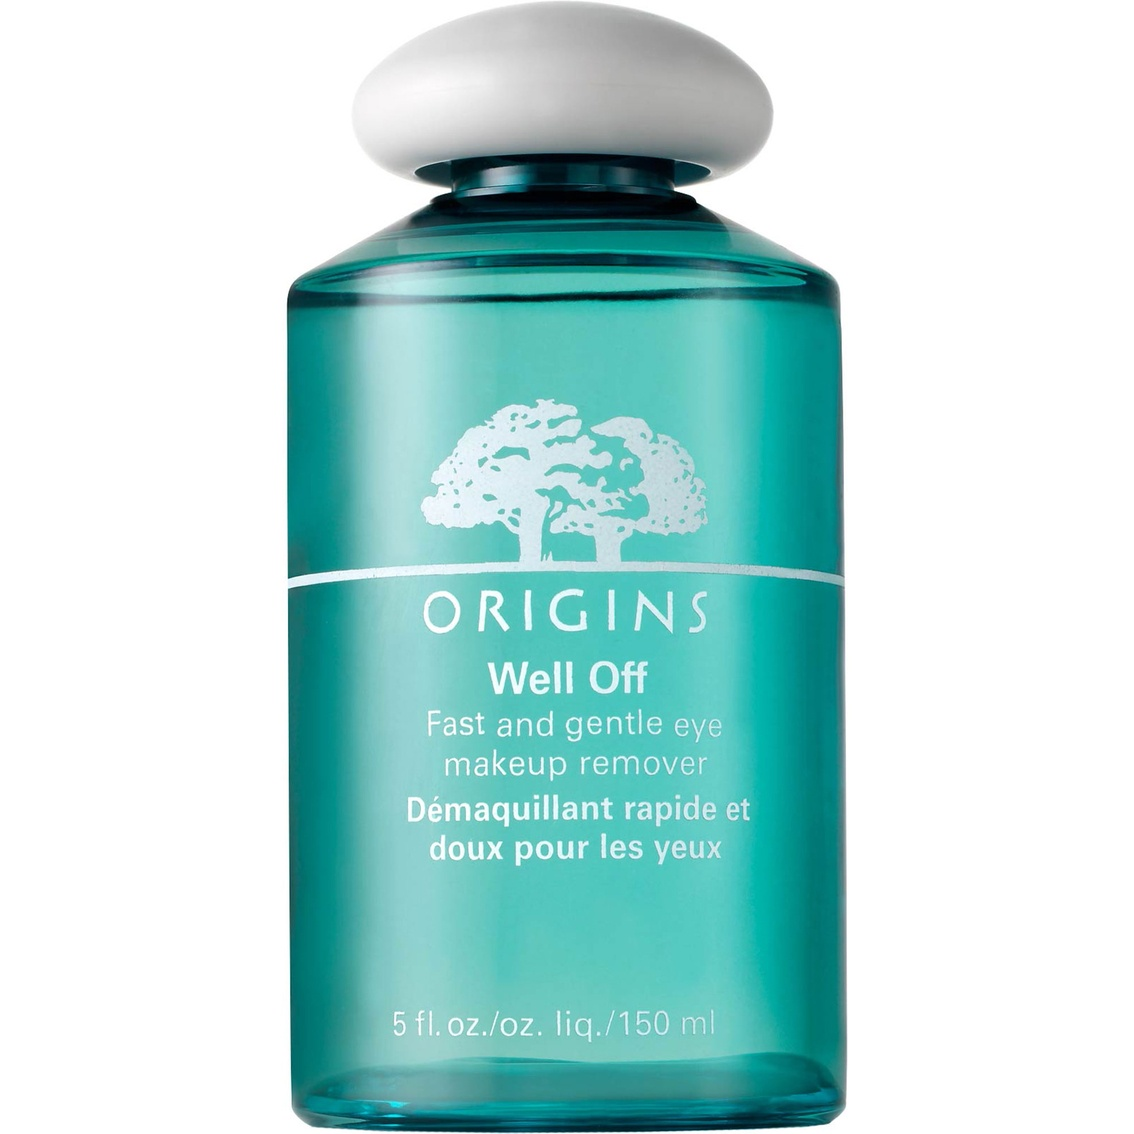 Origins Well Off Fast & Gentle Eye Makeup Remover, 150 ml